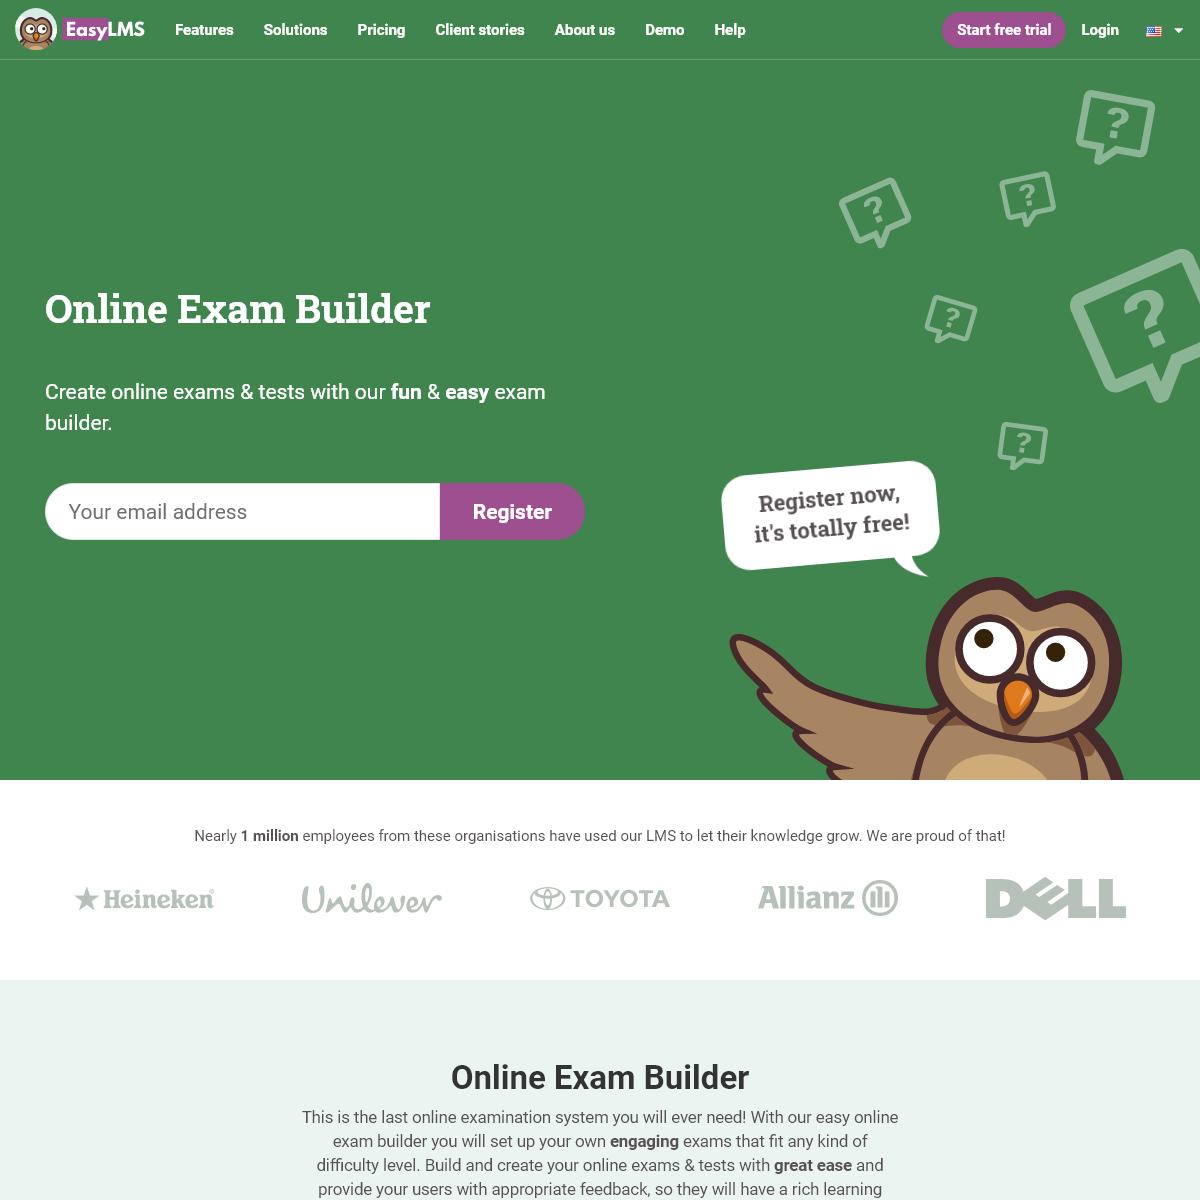 Online Exam Software to create Exams & Tests - Onlineexambuilder.com